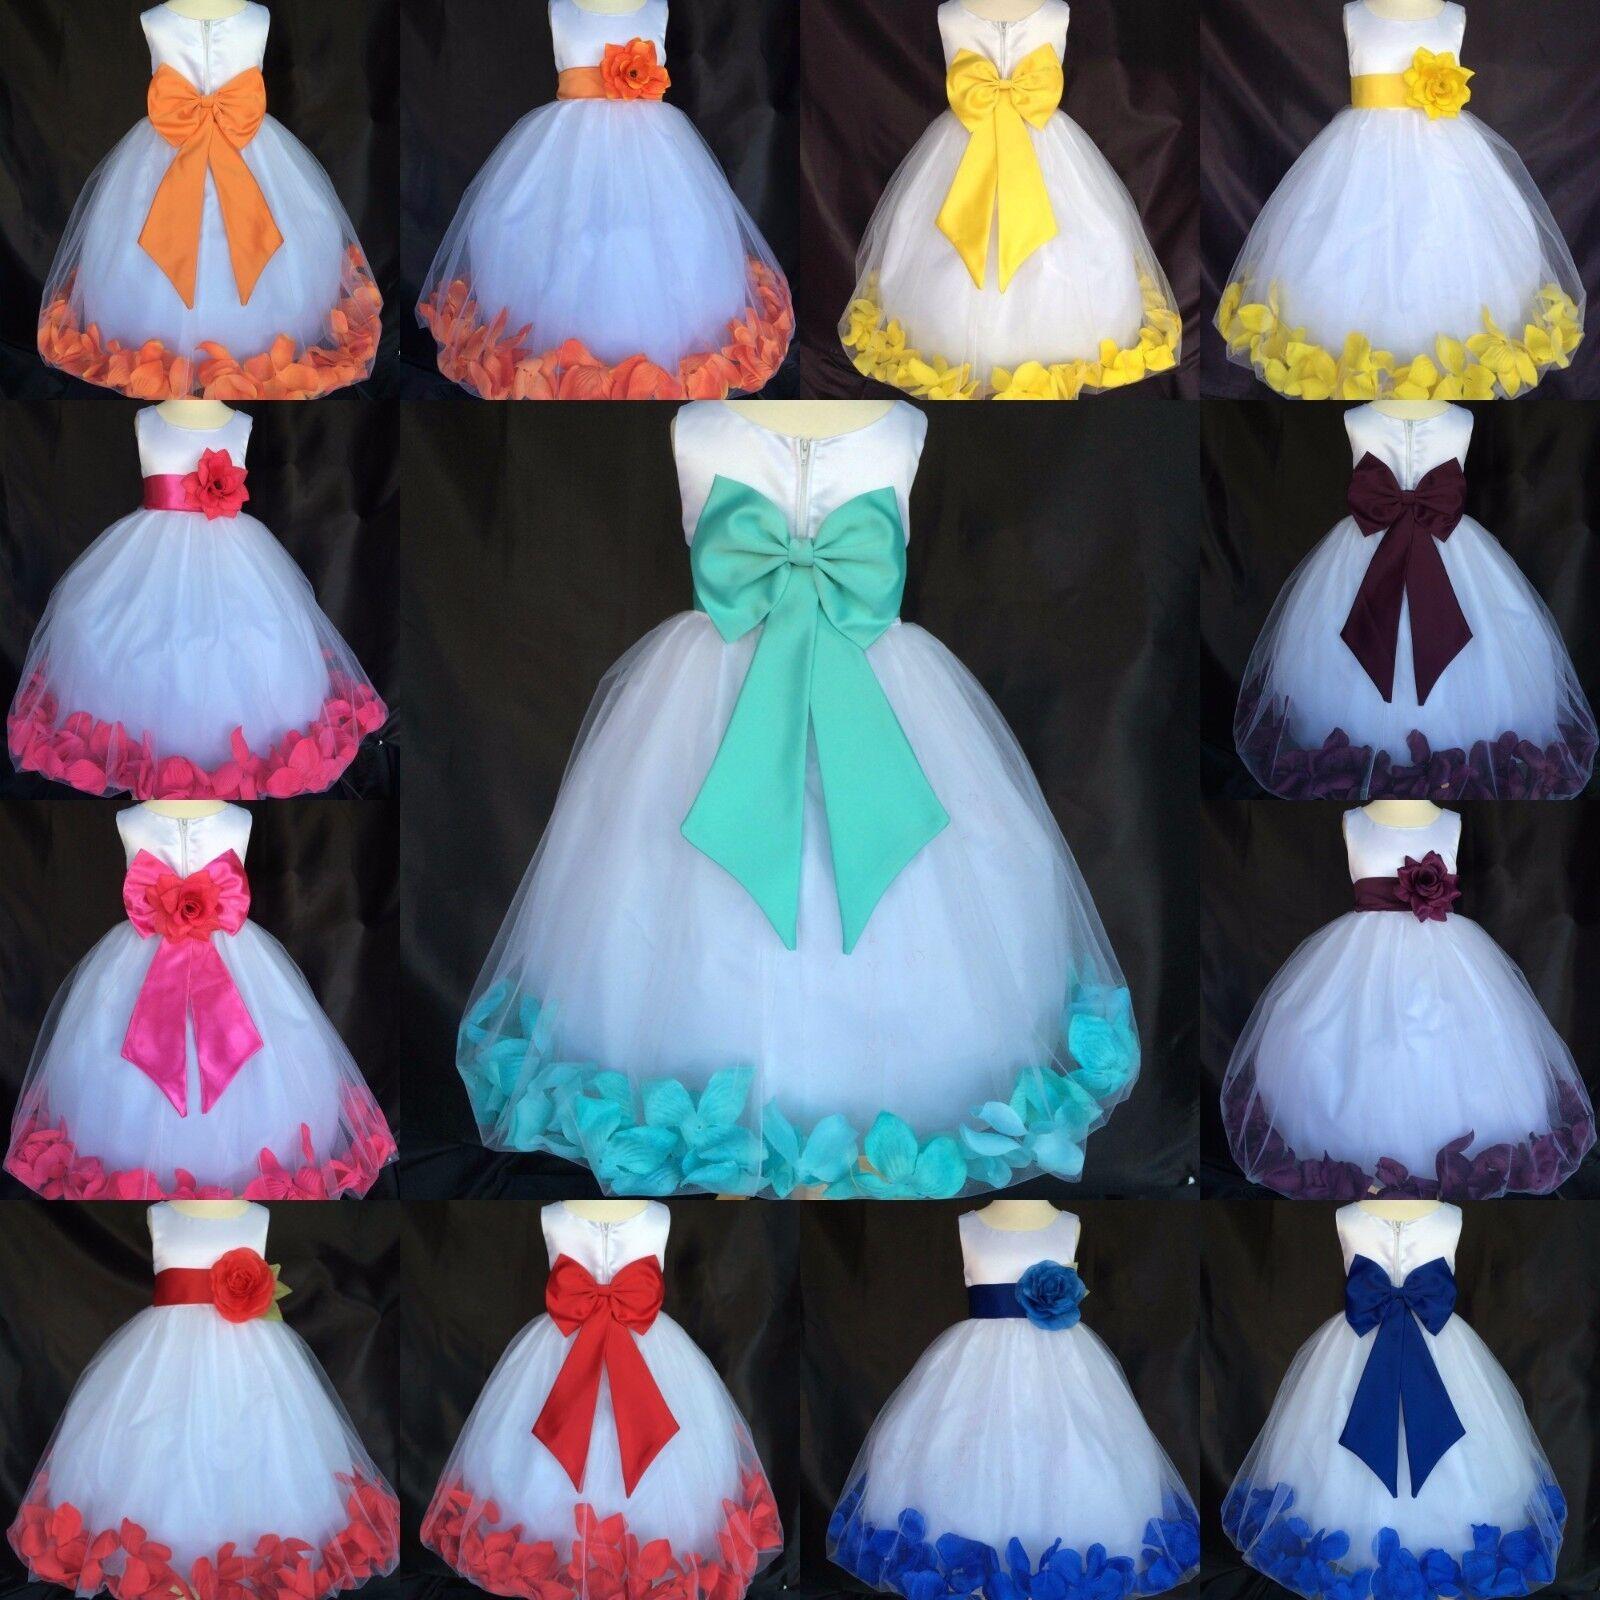 White Satin Tulle Rose Petal Dress Big Bow Easter Wedding Toddler Infant Girl 24